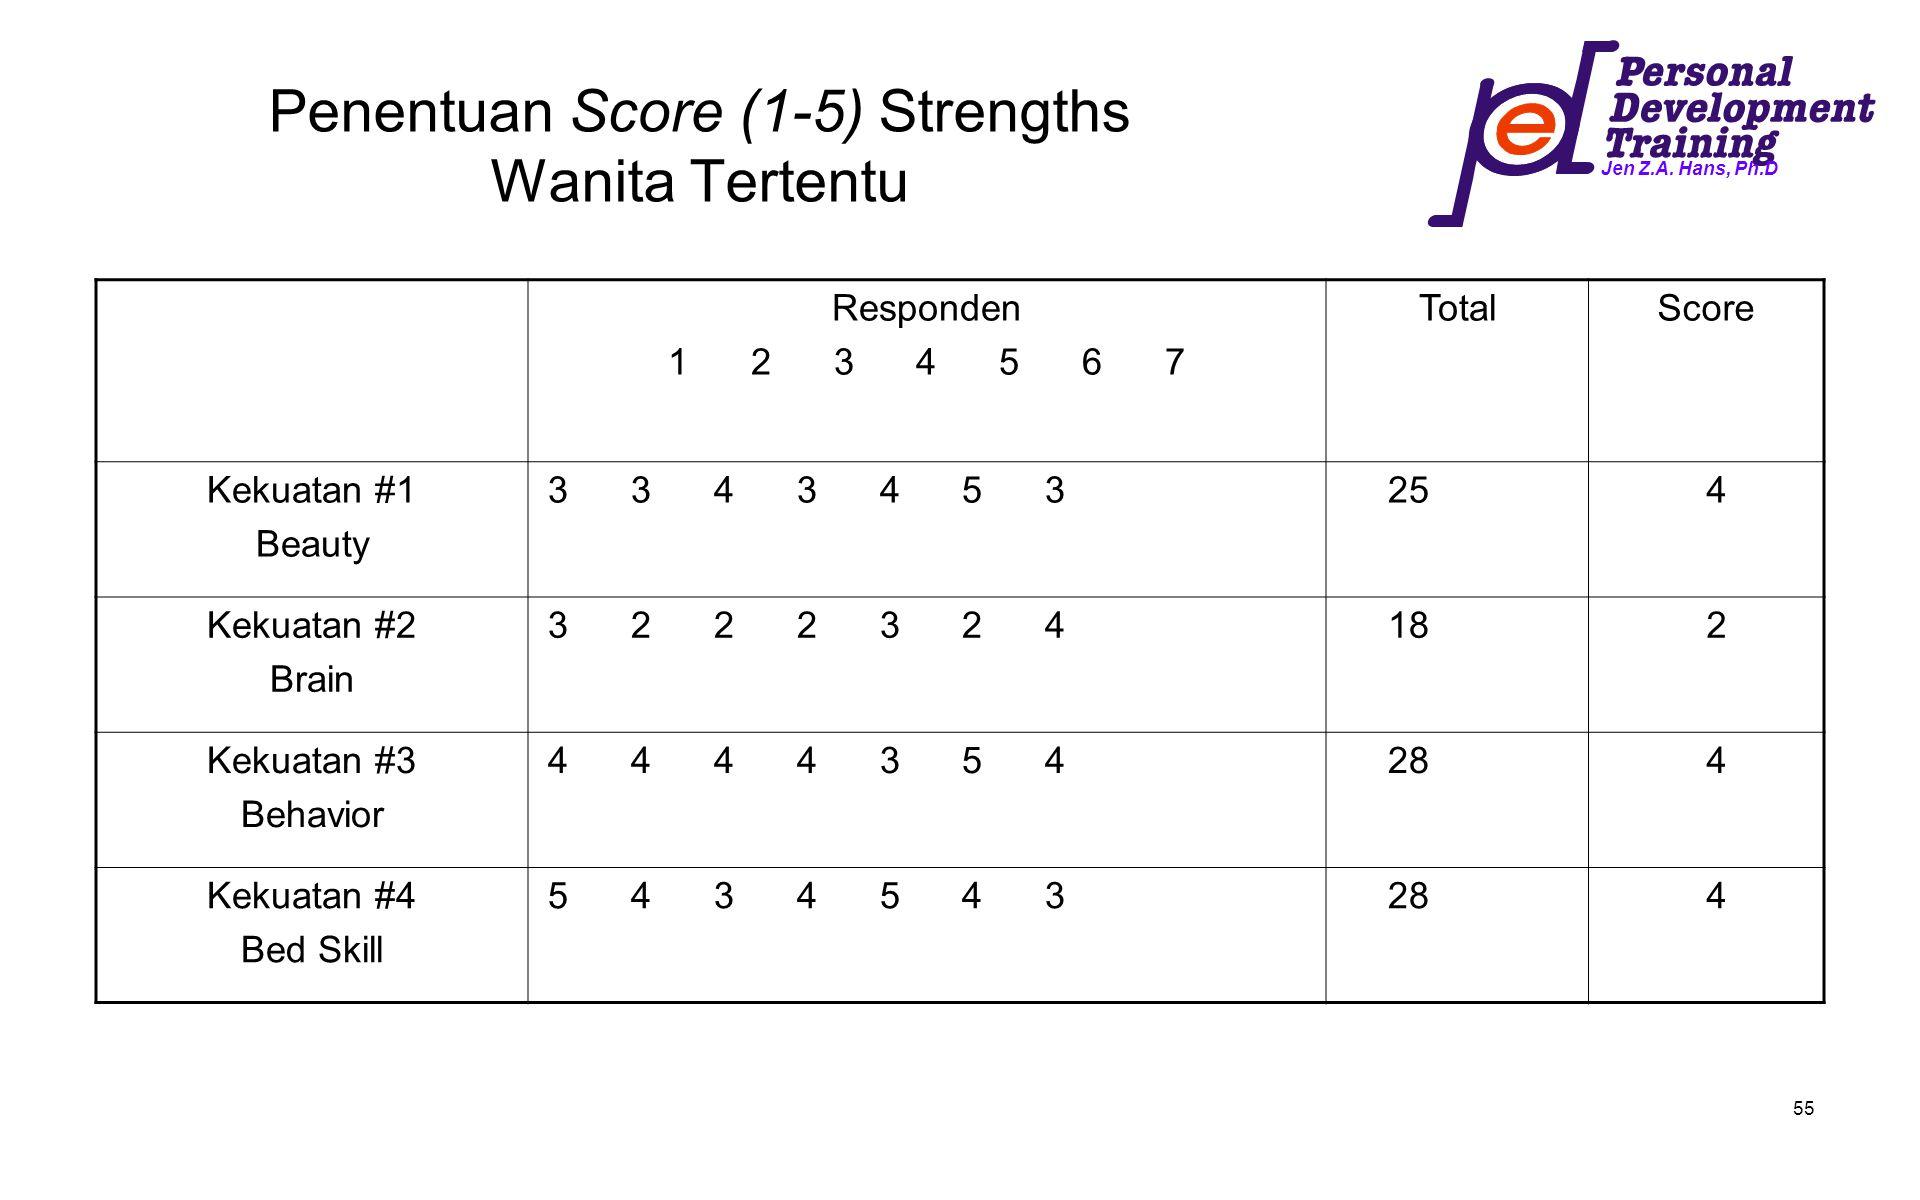 Jen Z.A. Hans, Ph.D 55 Penentuan Score (1-5) Strengths Wanita Tertentu Responden 1 2 3 4 5 6 7 TotalScore Kekuatan #1 Beauty 3 3 4 3 4 5 3 25 4 Kekuat